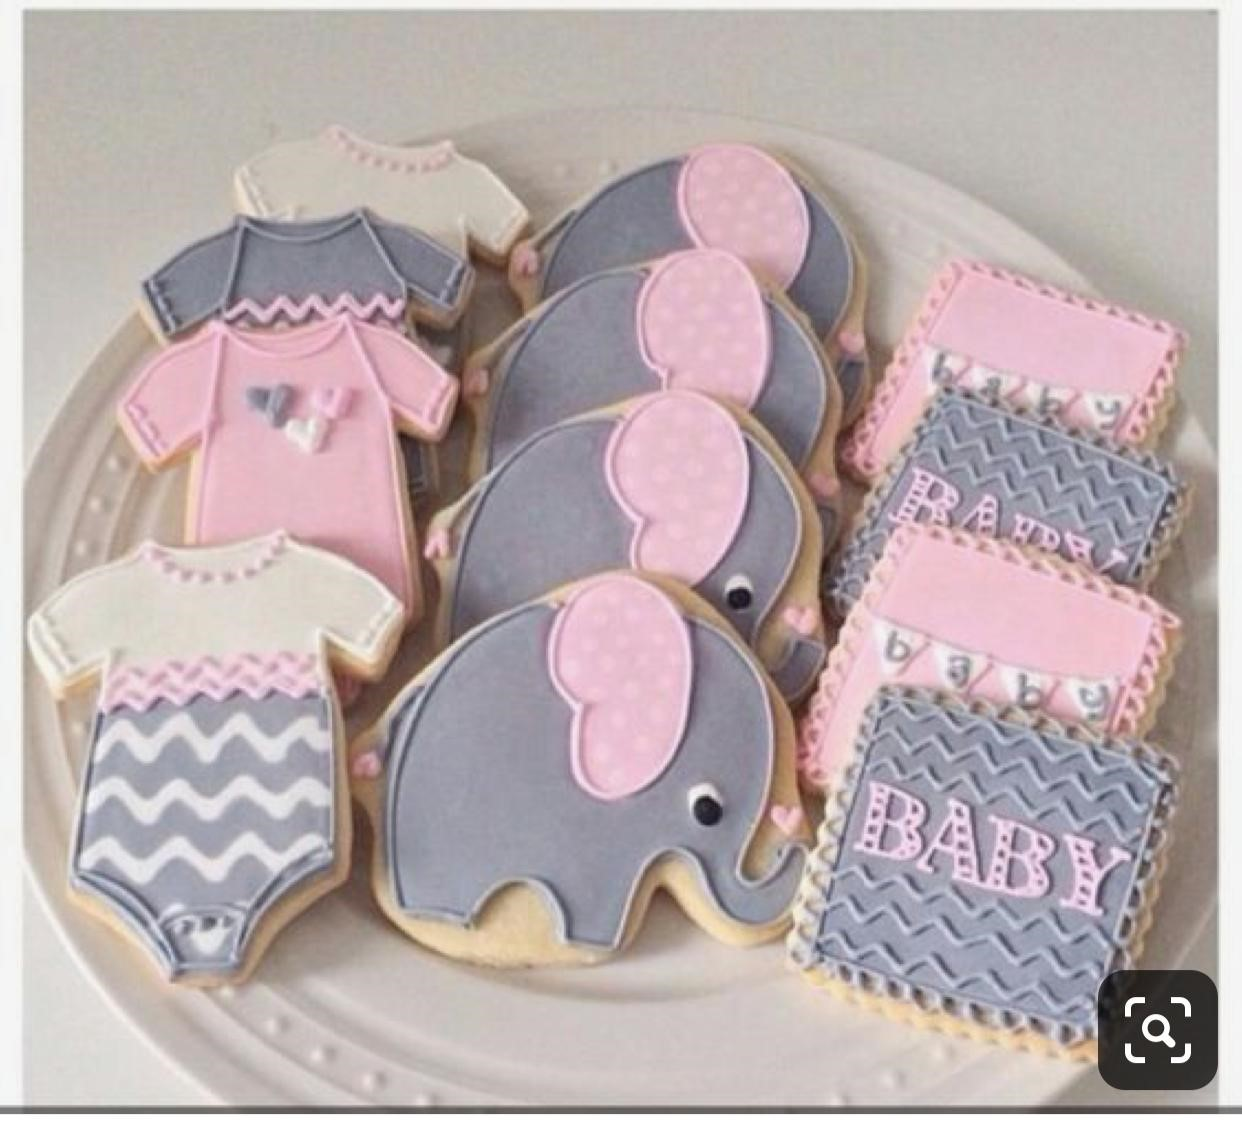 trabajos-pasteles-pastelitos (1)